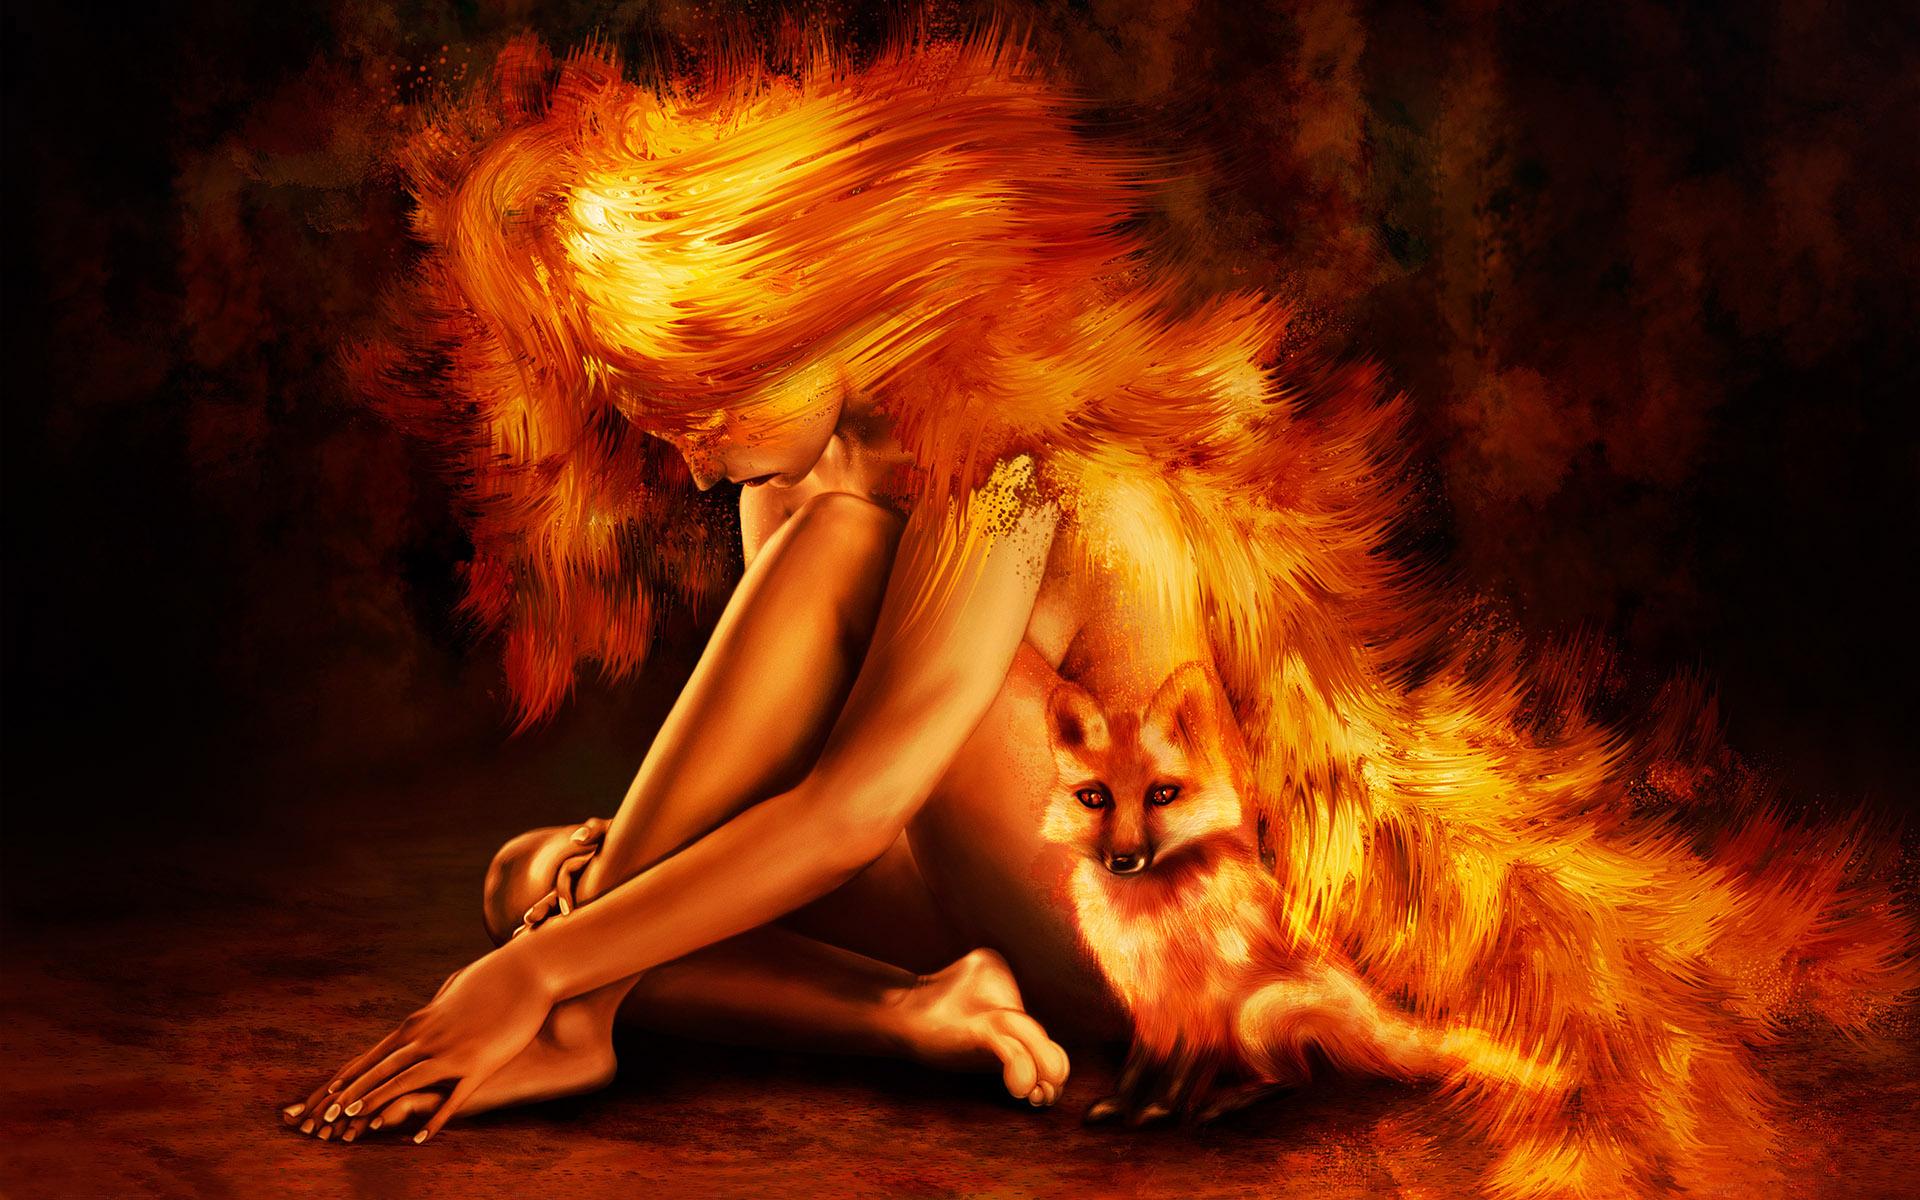 31 best images about Dark Fantasy on Pinterest